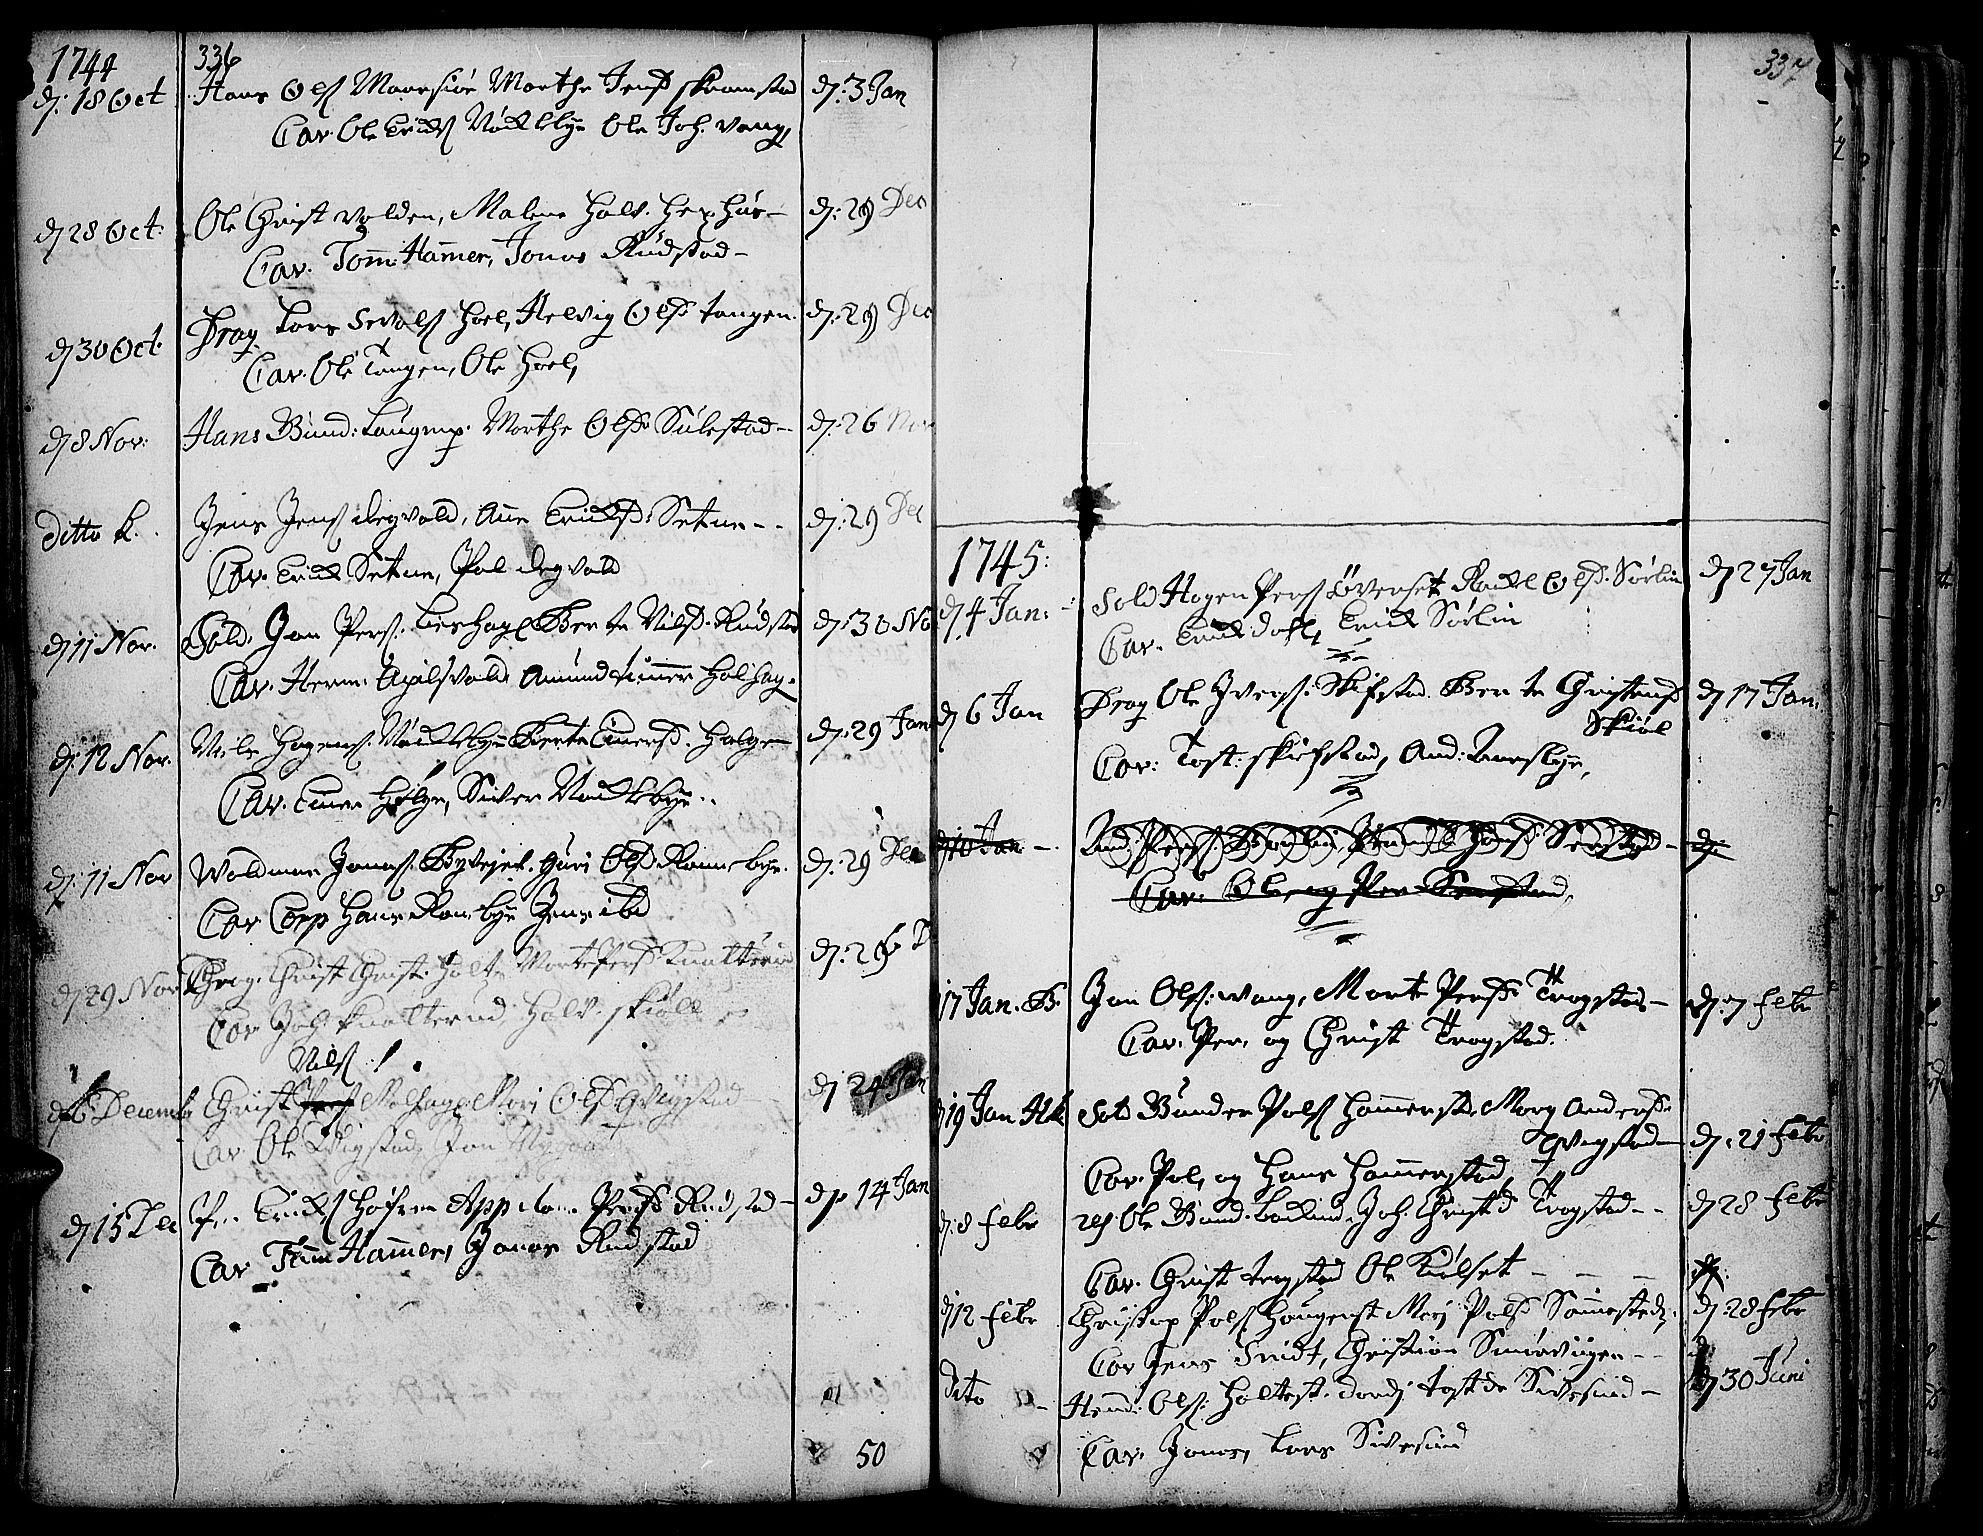 SAH, Toten prestekontor, Ministerialbok nr. 3, 1734-1751, s. 336-337